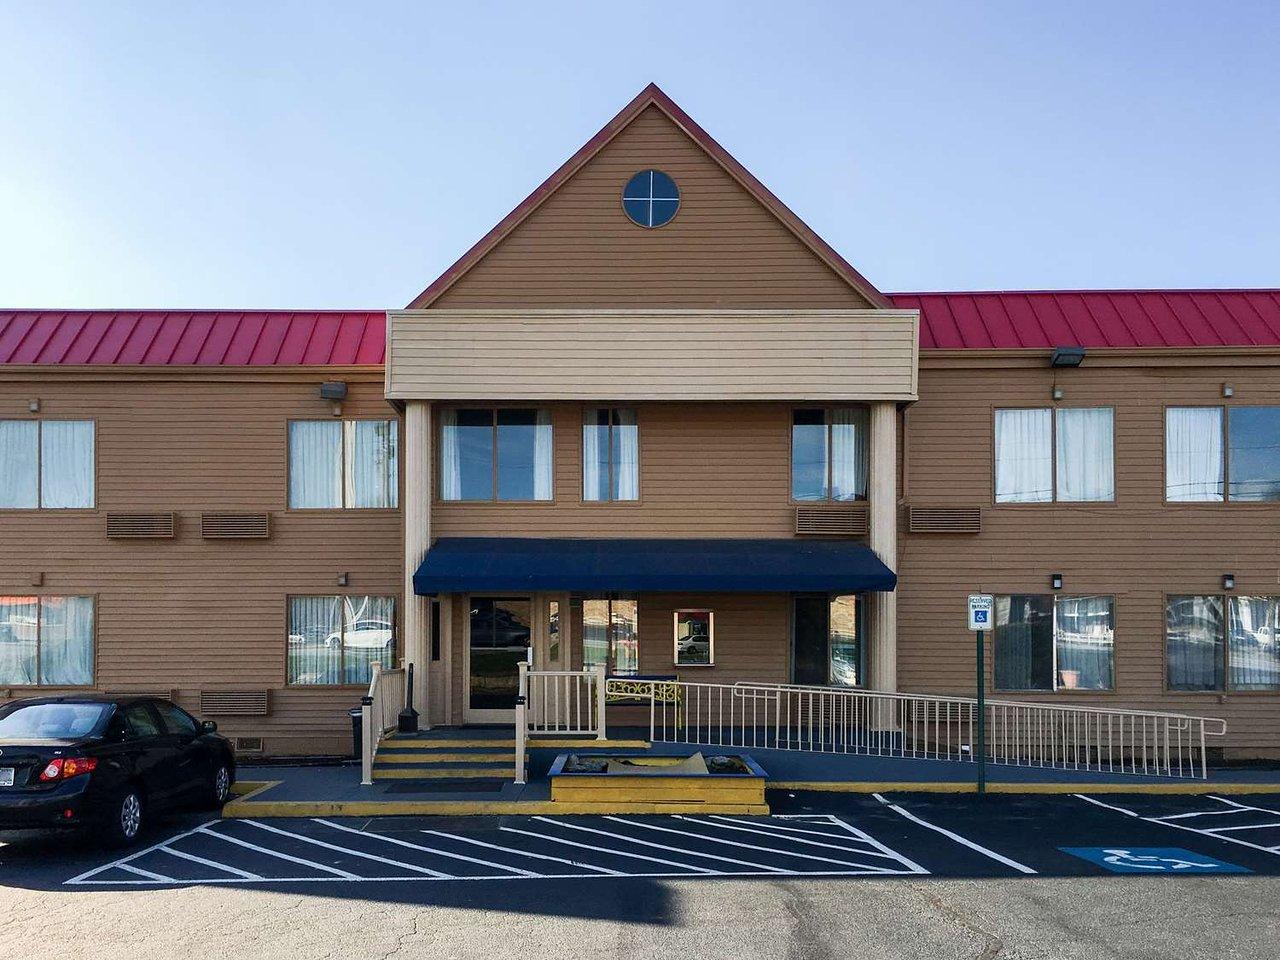 Days Inn By Wyndham Thomson 49 6 1 Updated 2018 Room Prices Motel Reviews Ga Tripadvisor